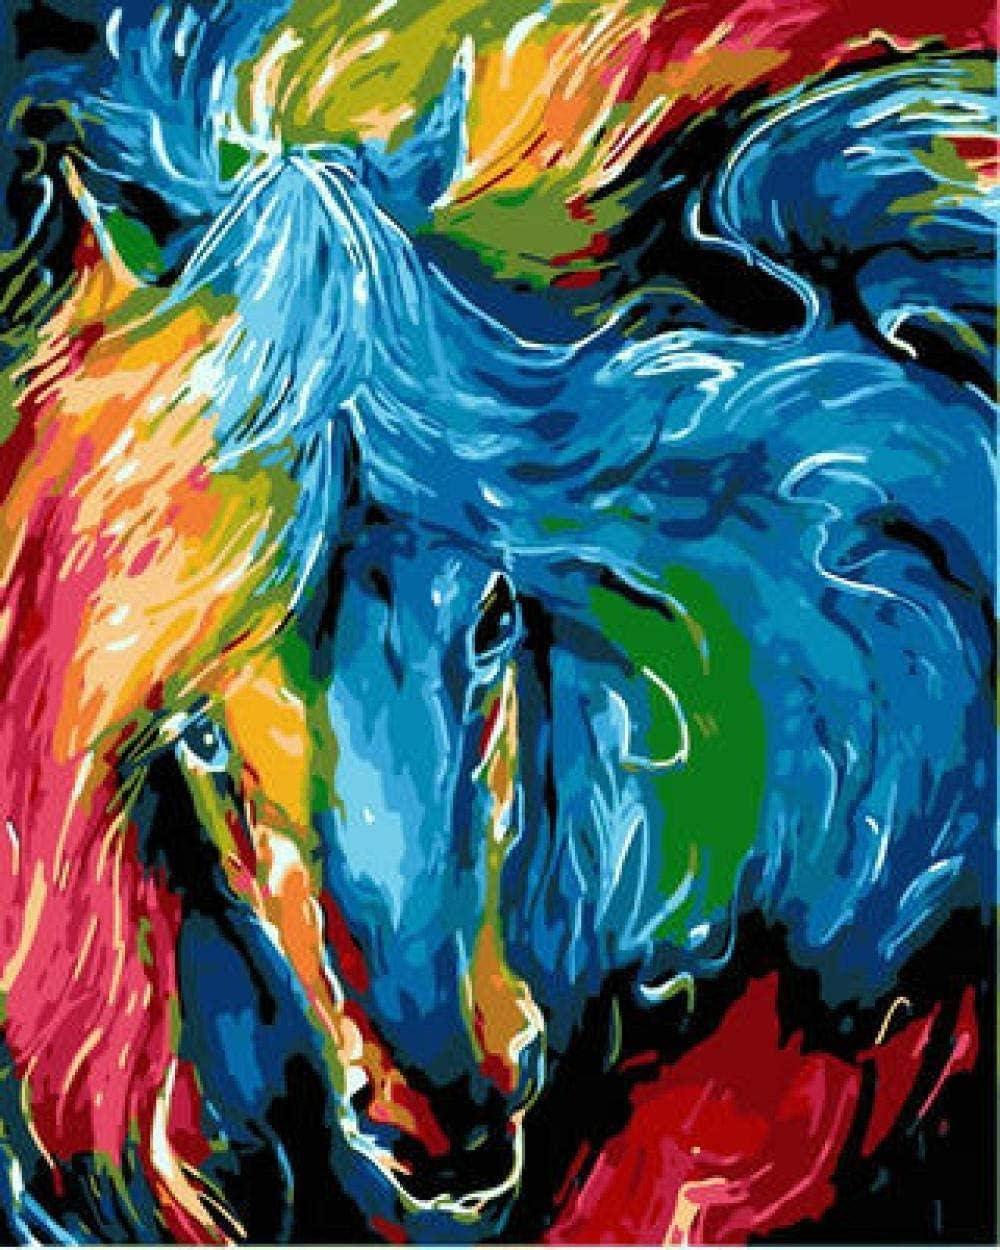 Diy Pintura al óleo por número Pintura Color cabeza de caballo con kits de pintura para principiantes de bricolaje sobre lienzo 16x20 pulgadas